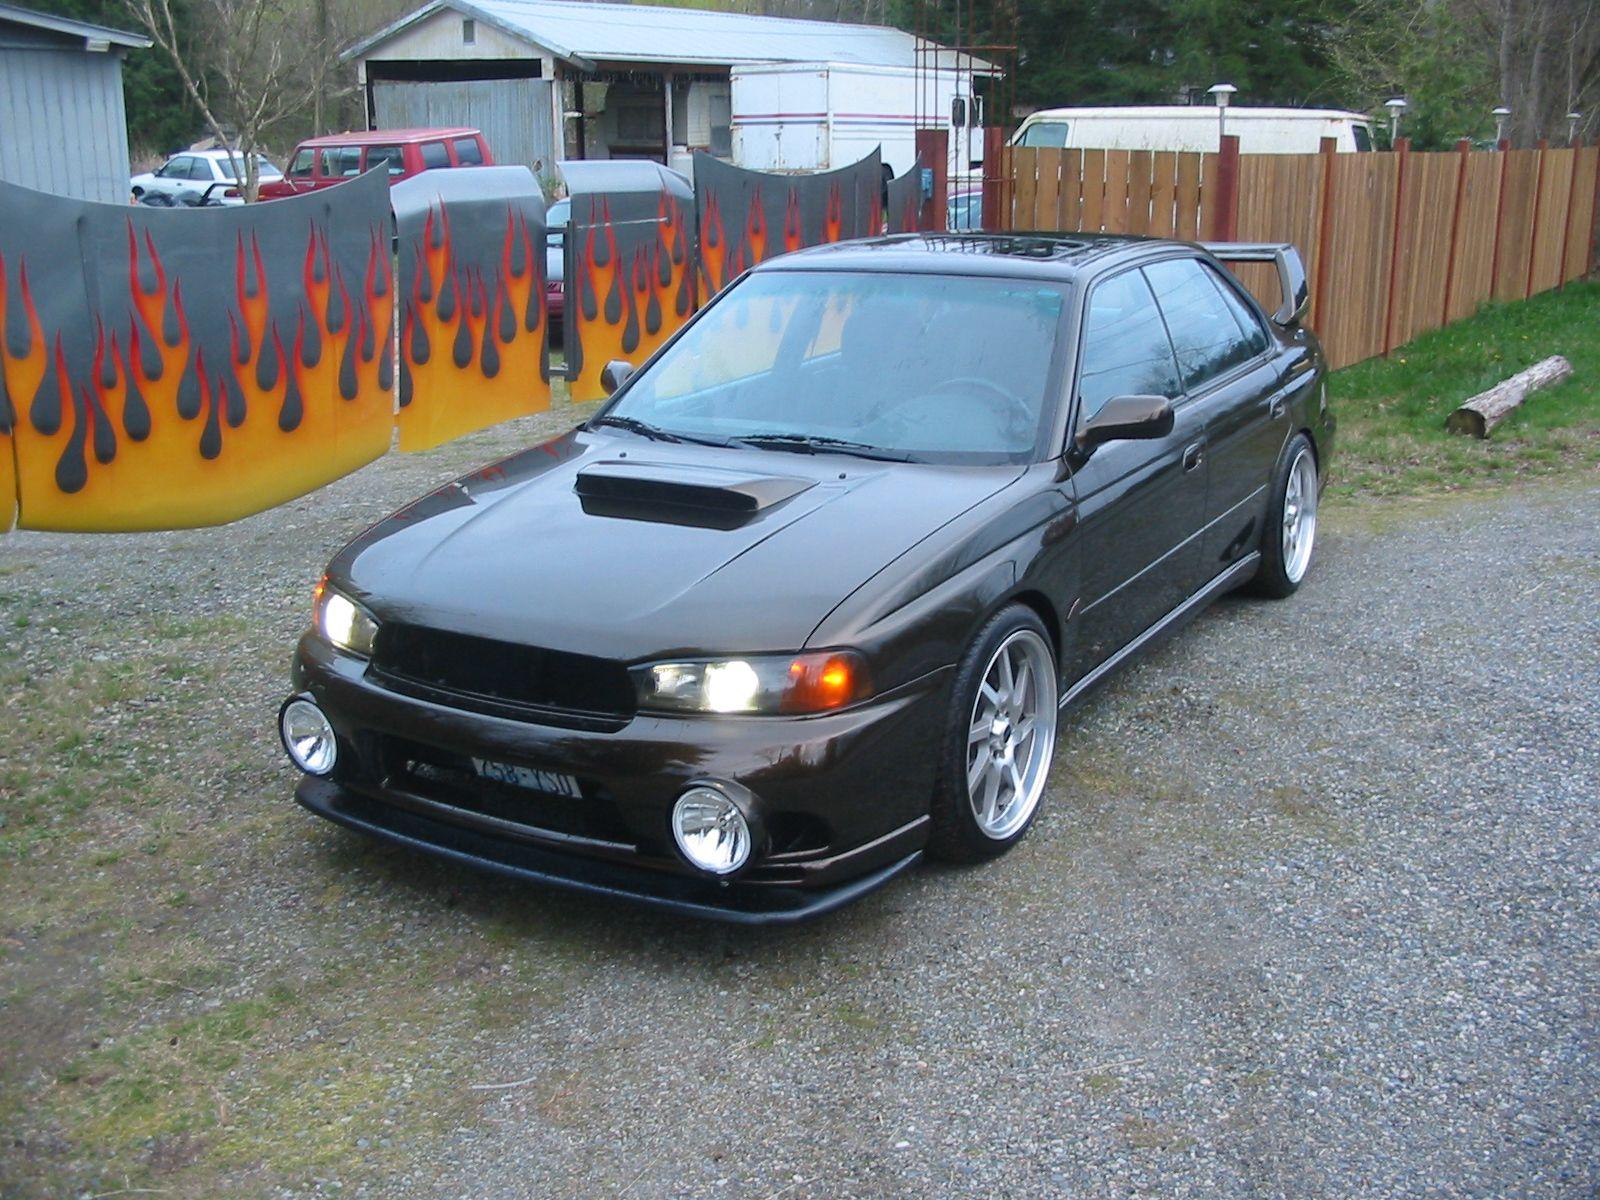 Customized 1999 Subaru Legacy GT